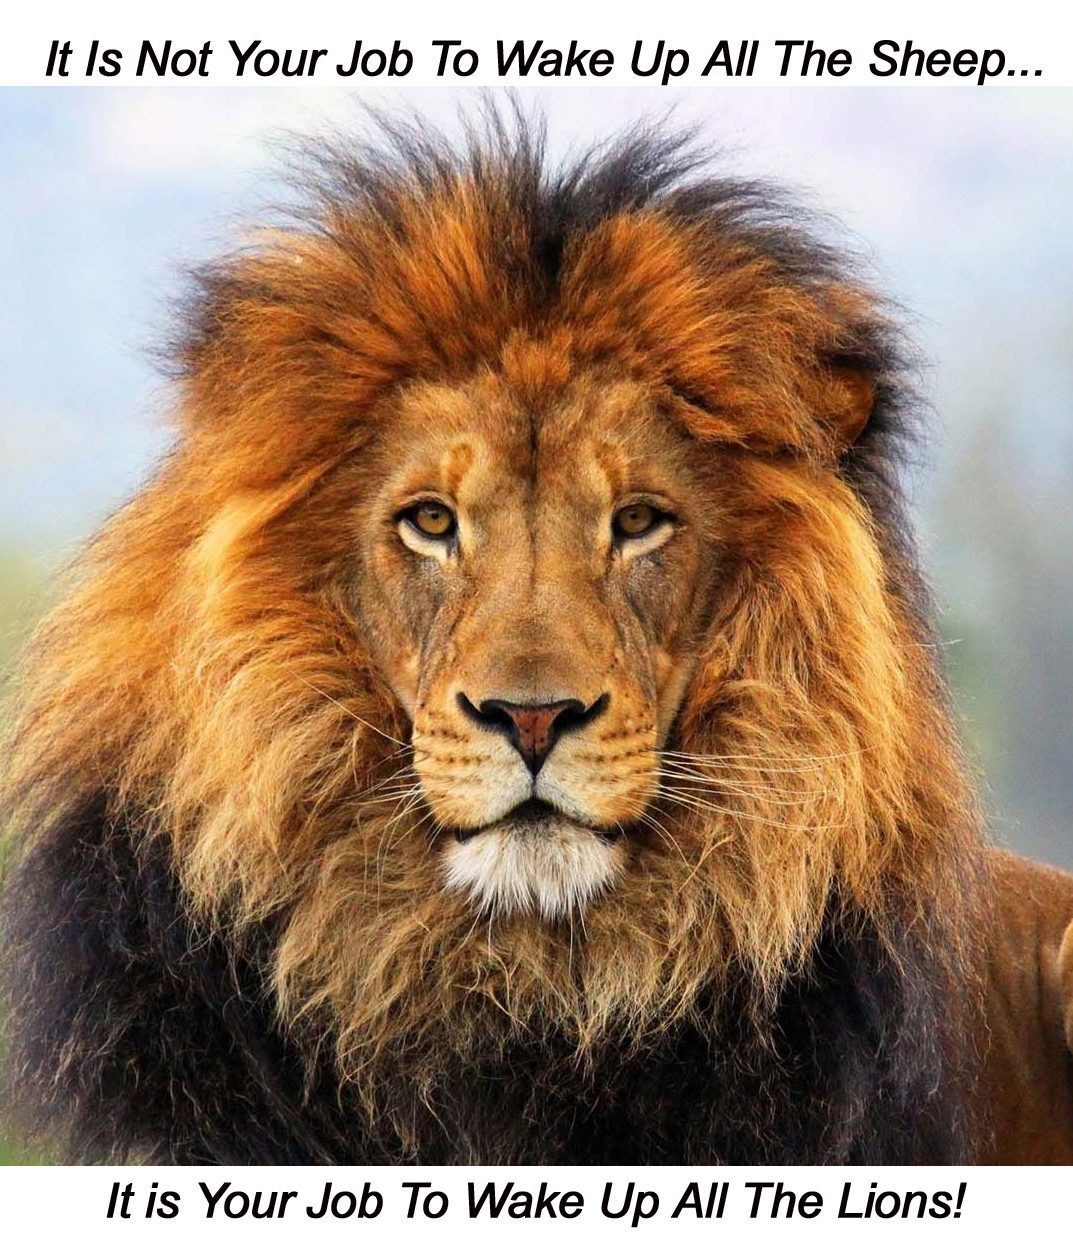 lion sheep heauntitled 2 copy